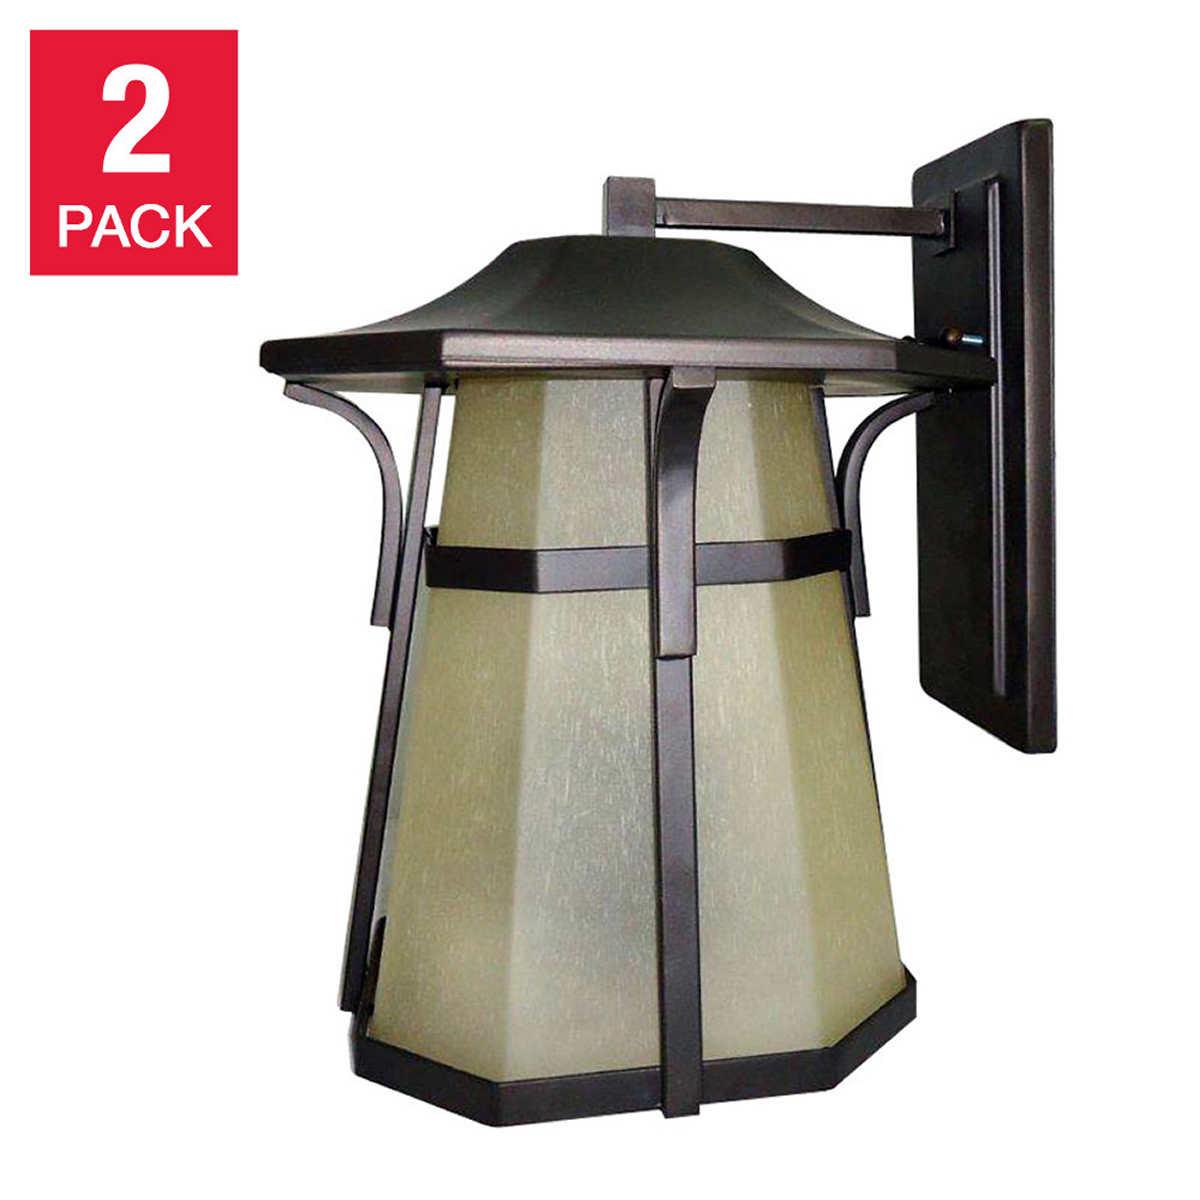 Solar patio lights costco - Litex Outdoor Wall Light Fixture Aged Bronze Coach Lamp 2 Pack